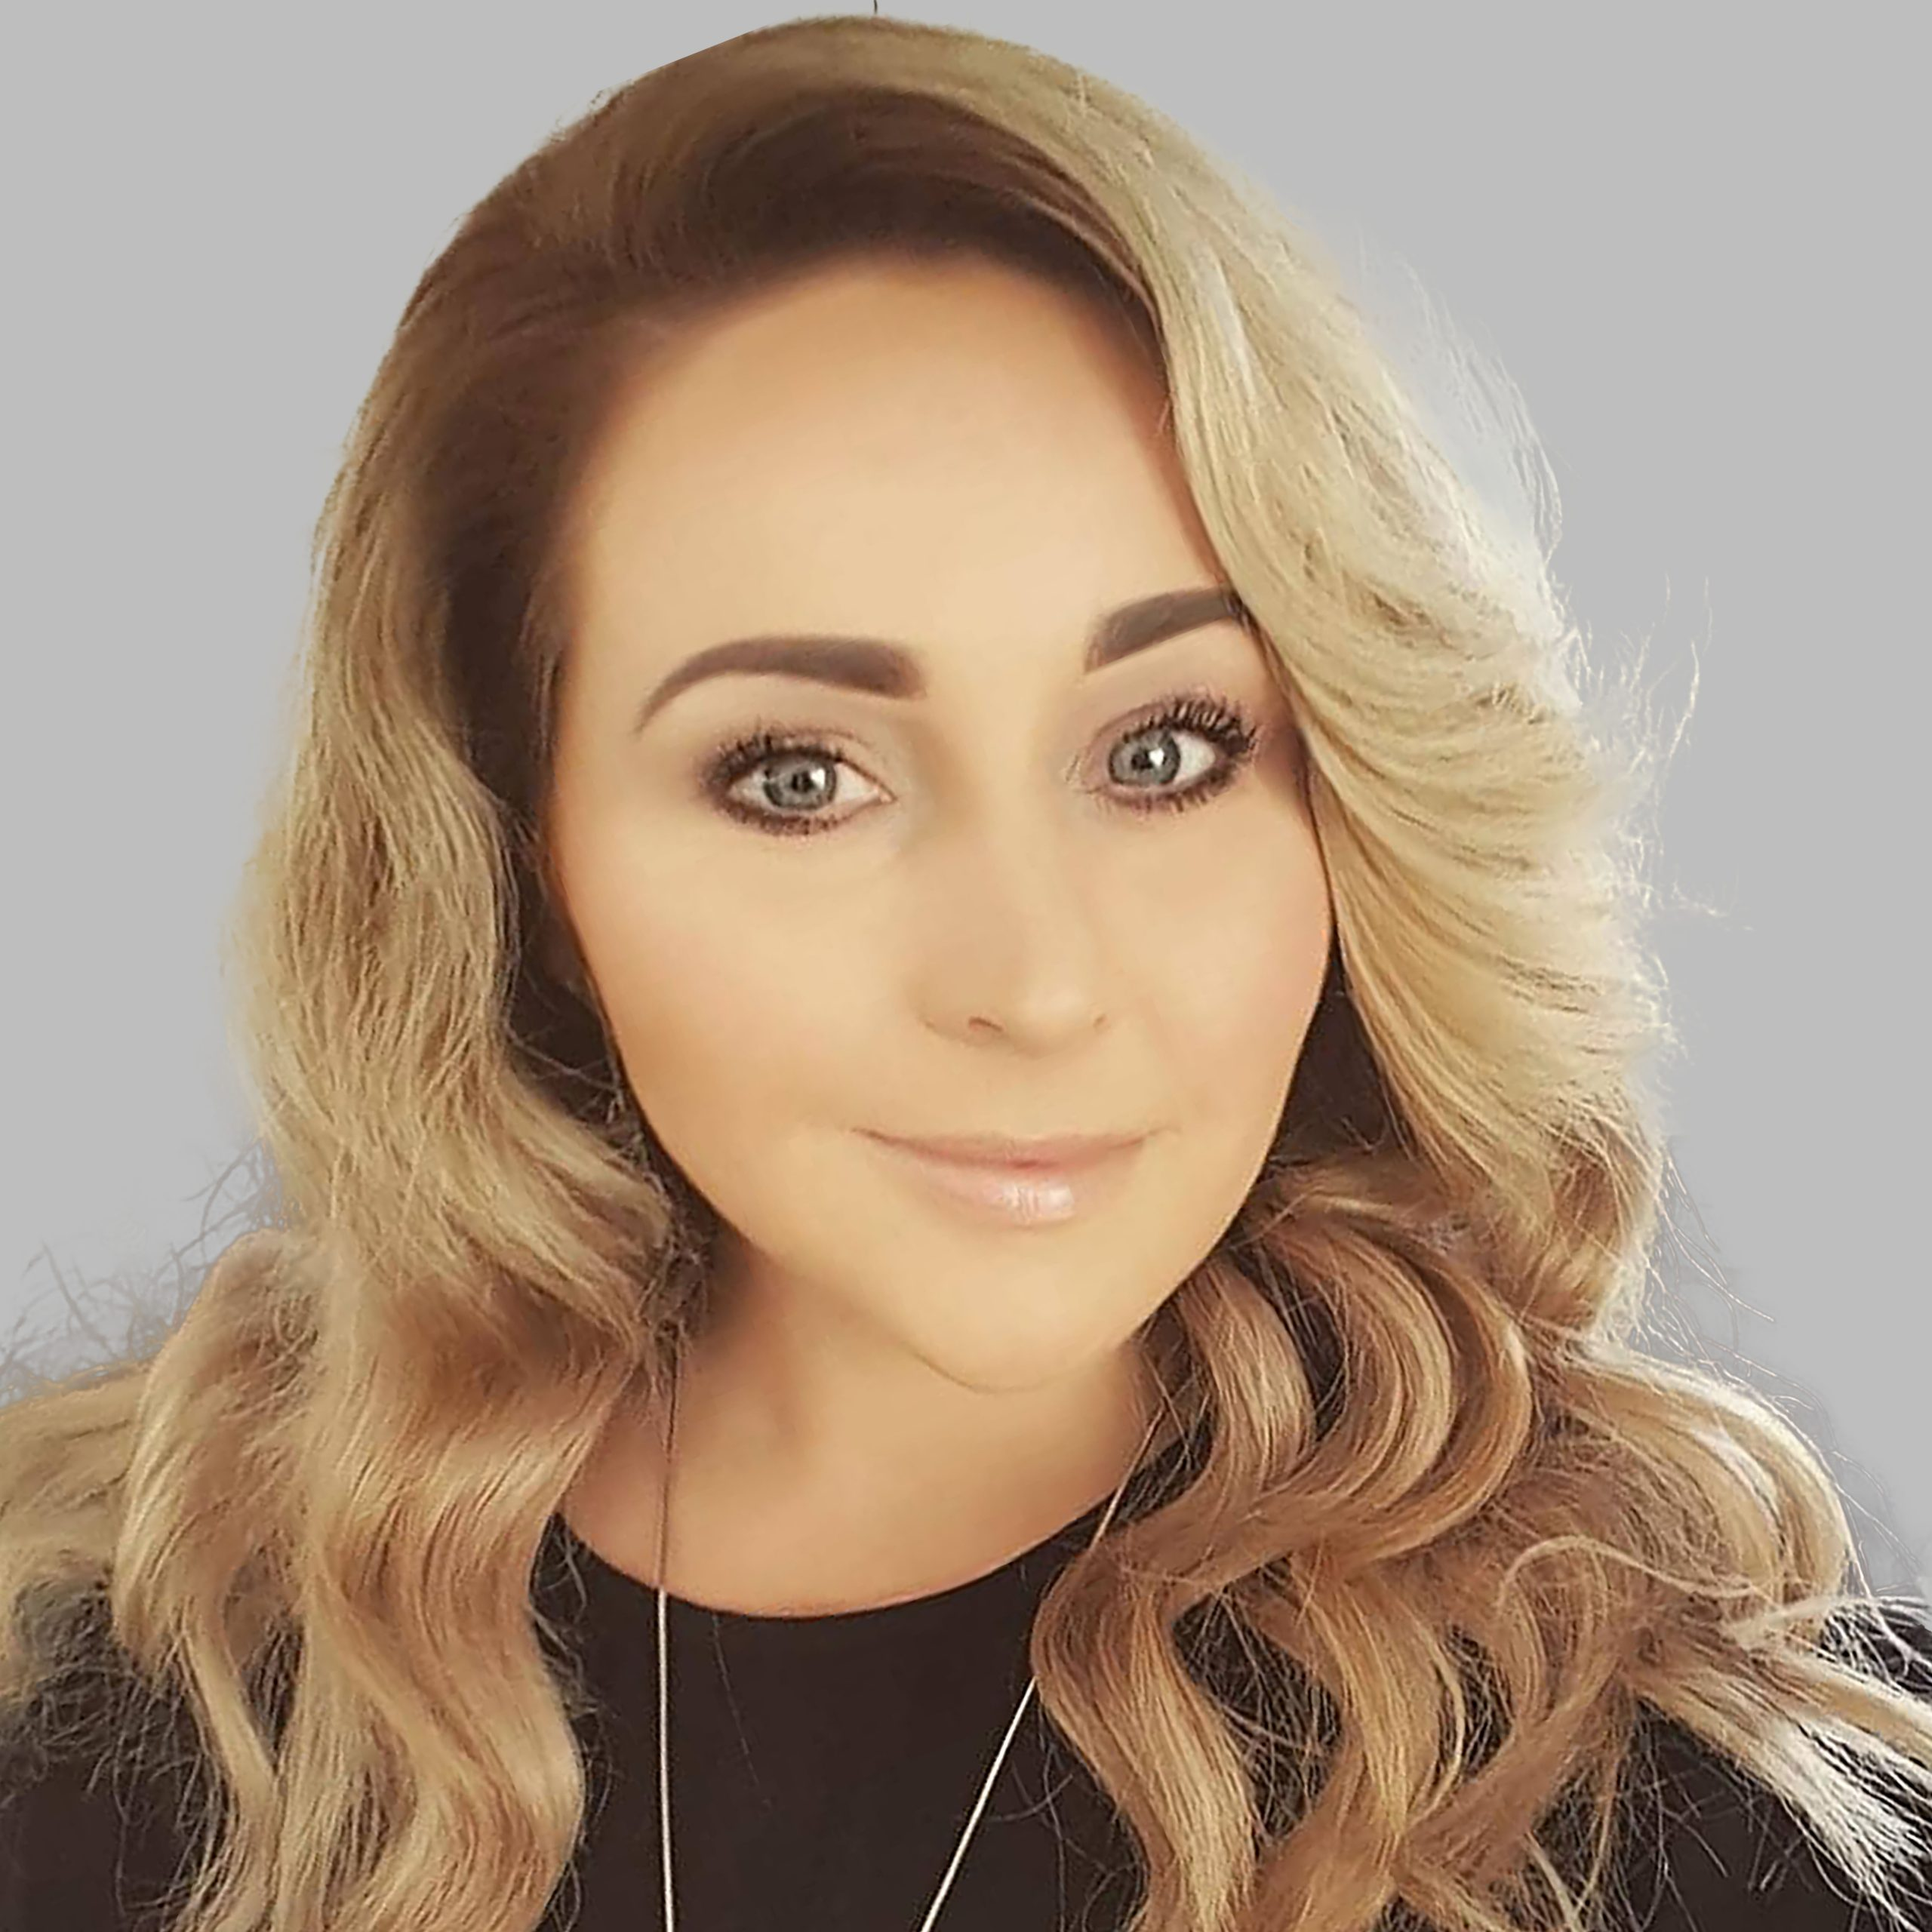 Charlotte Smith